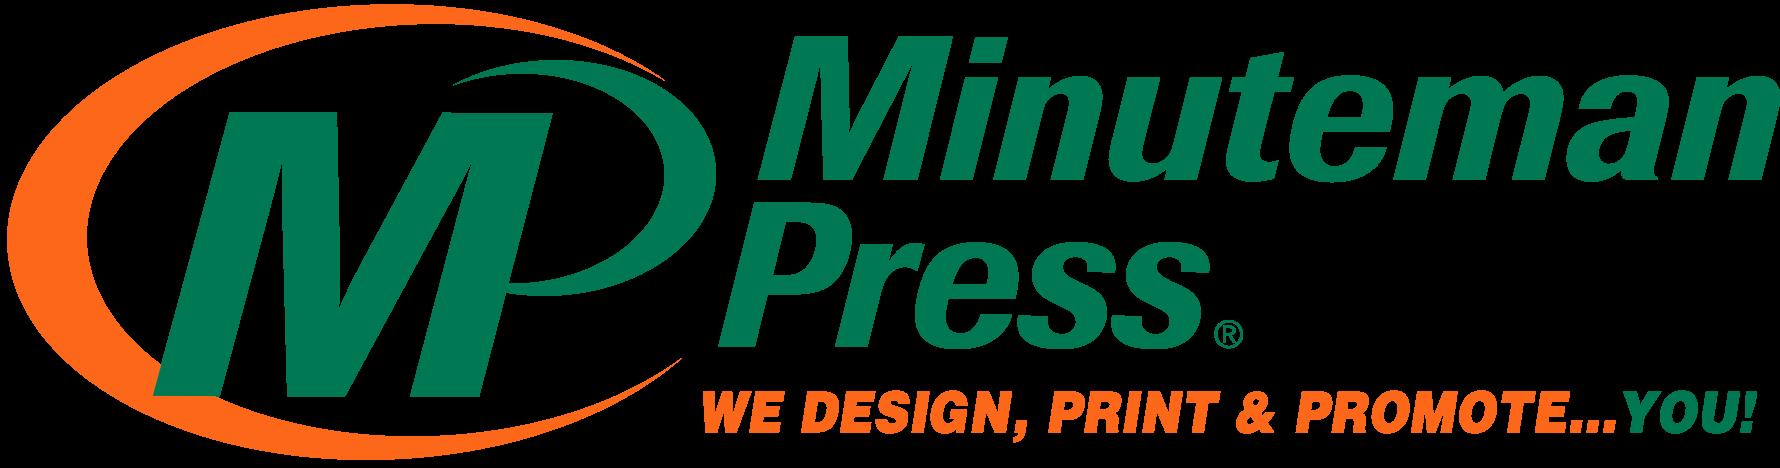 minuteman_press_logo.png